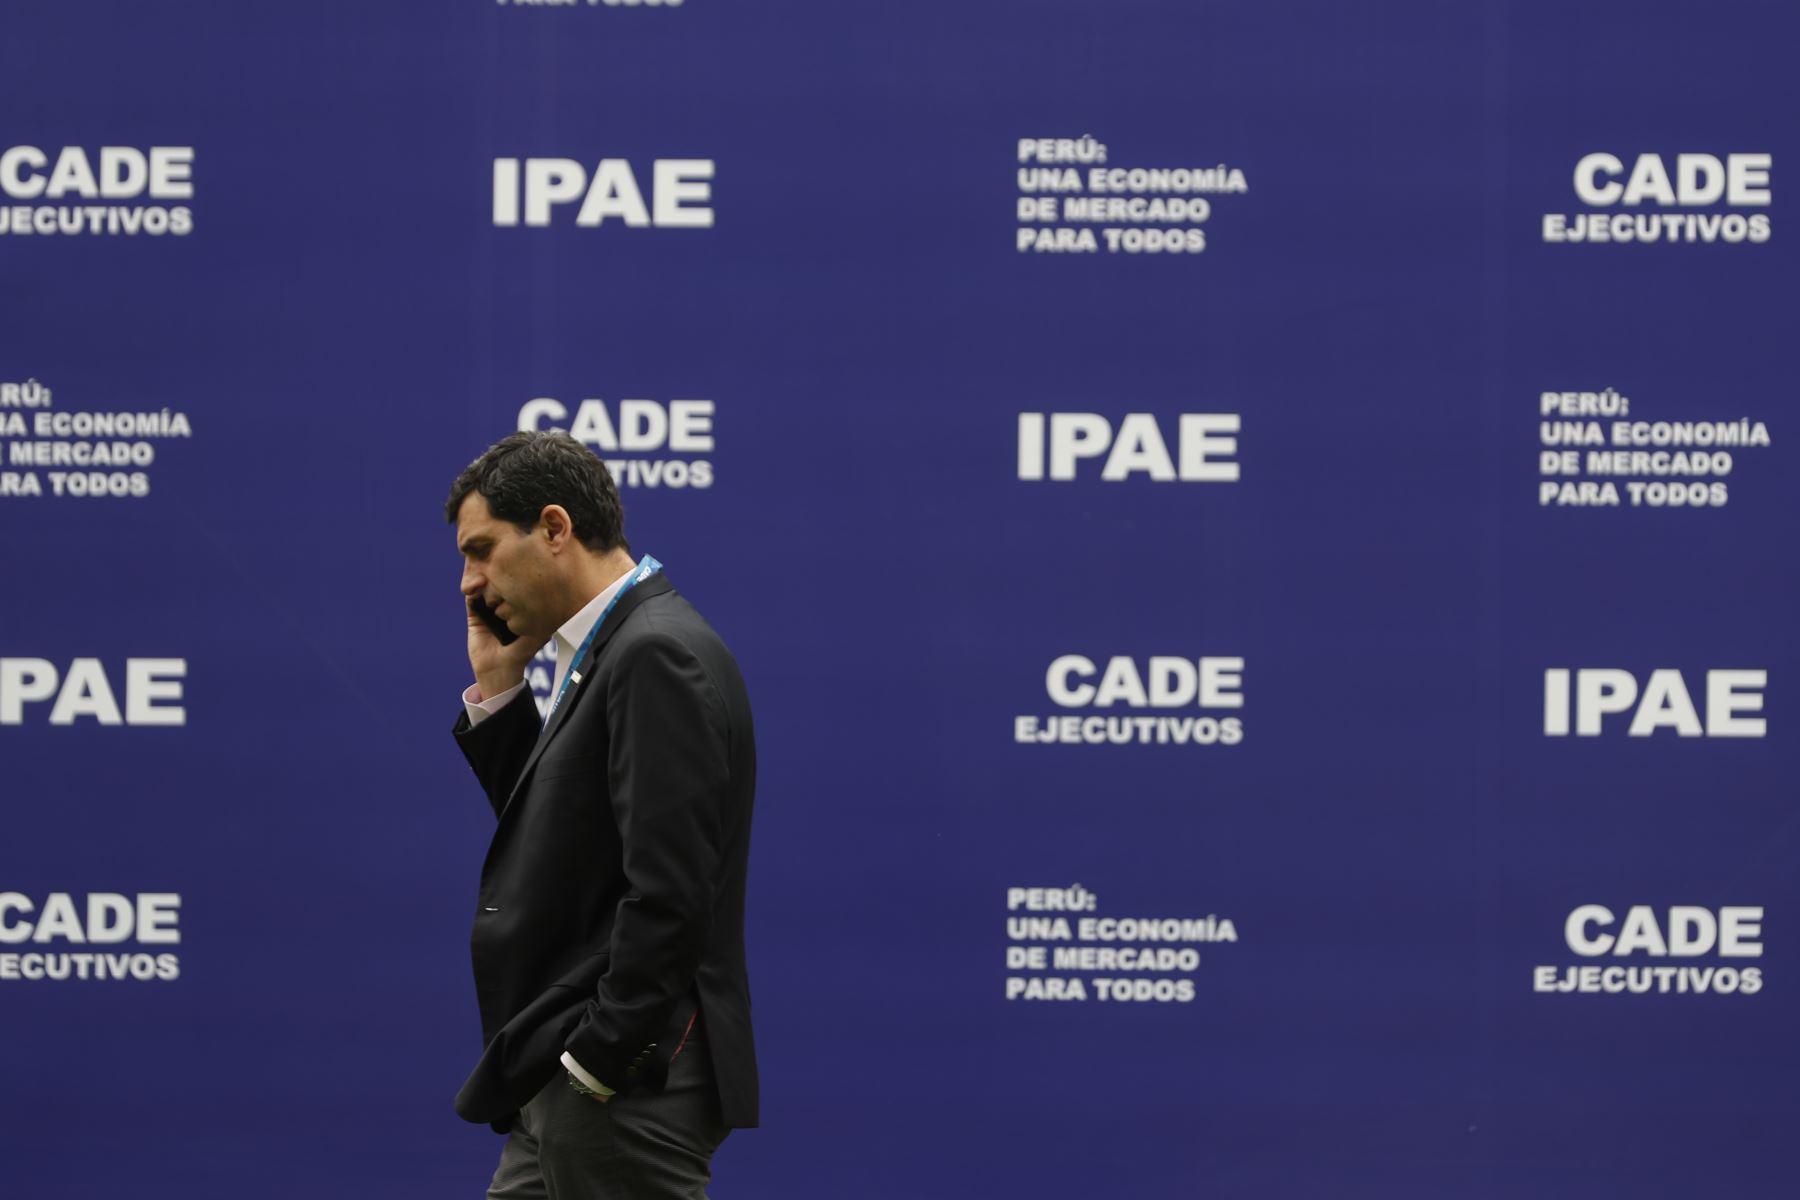 CADE Ejecutivos 2019. Foto: ANDINA/Renato Pajuelo